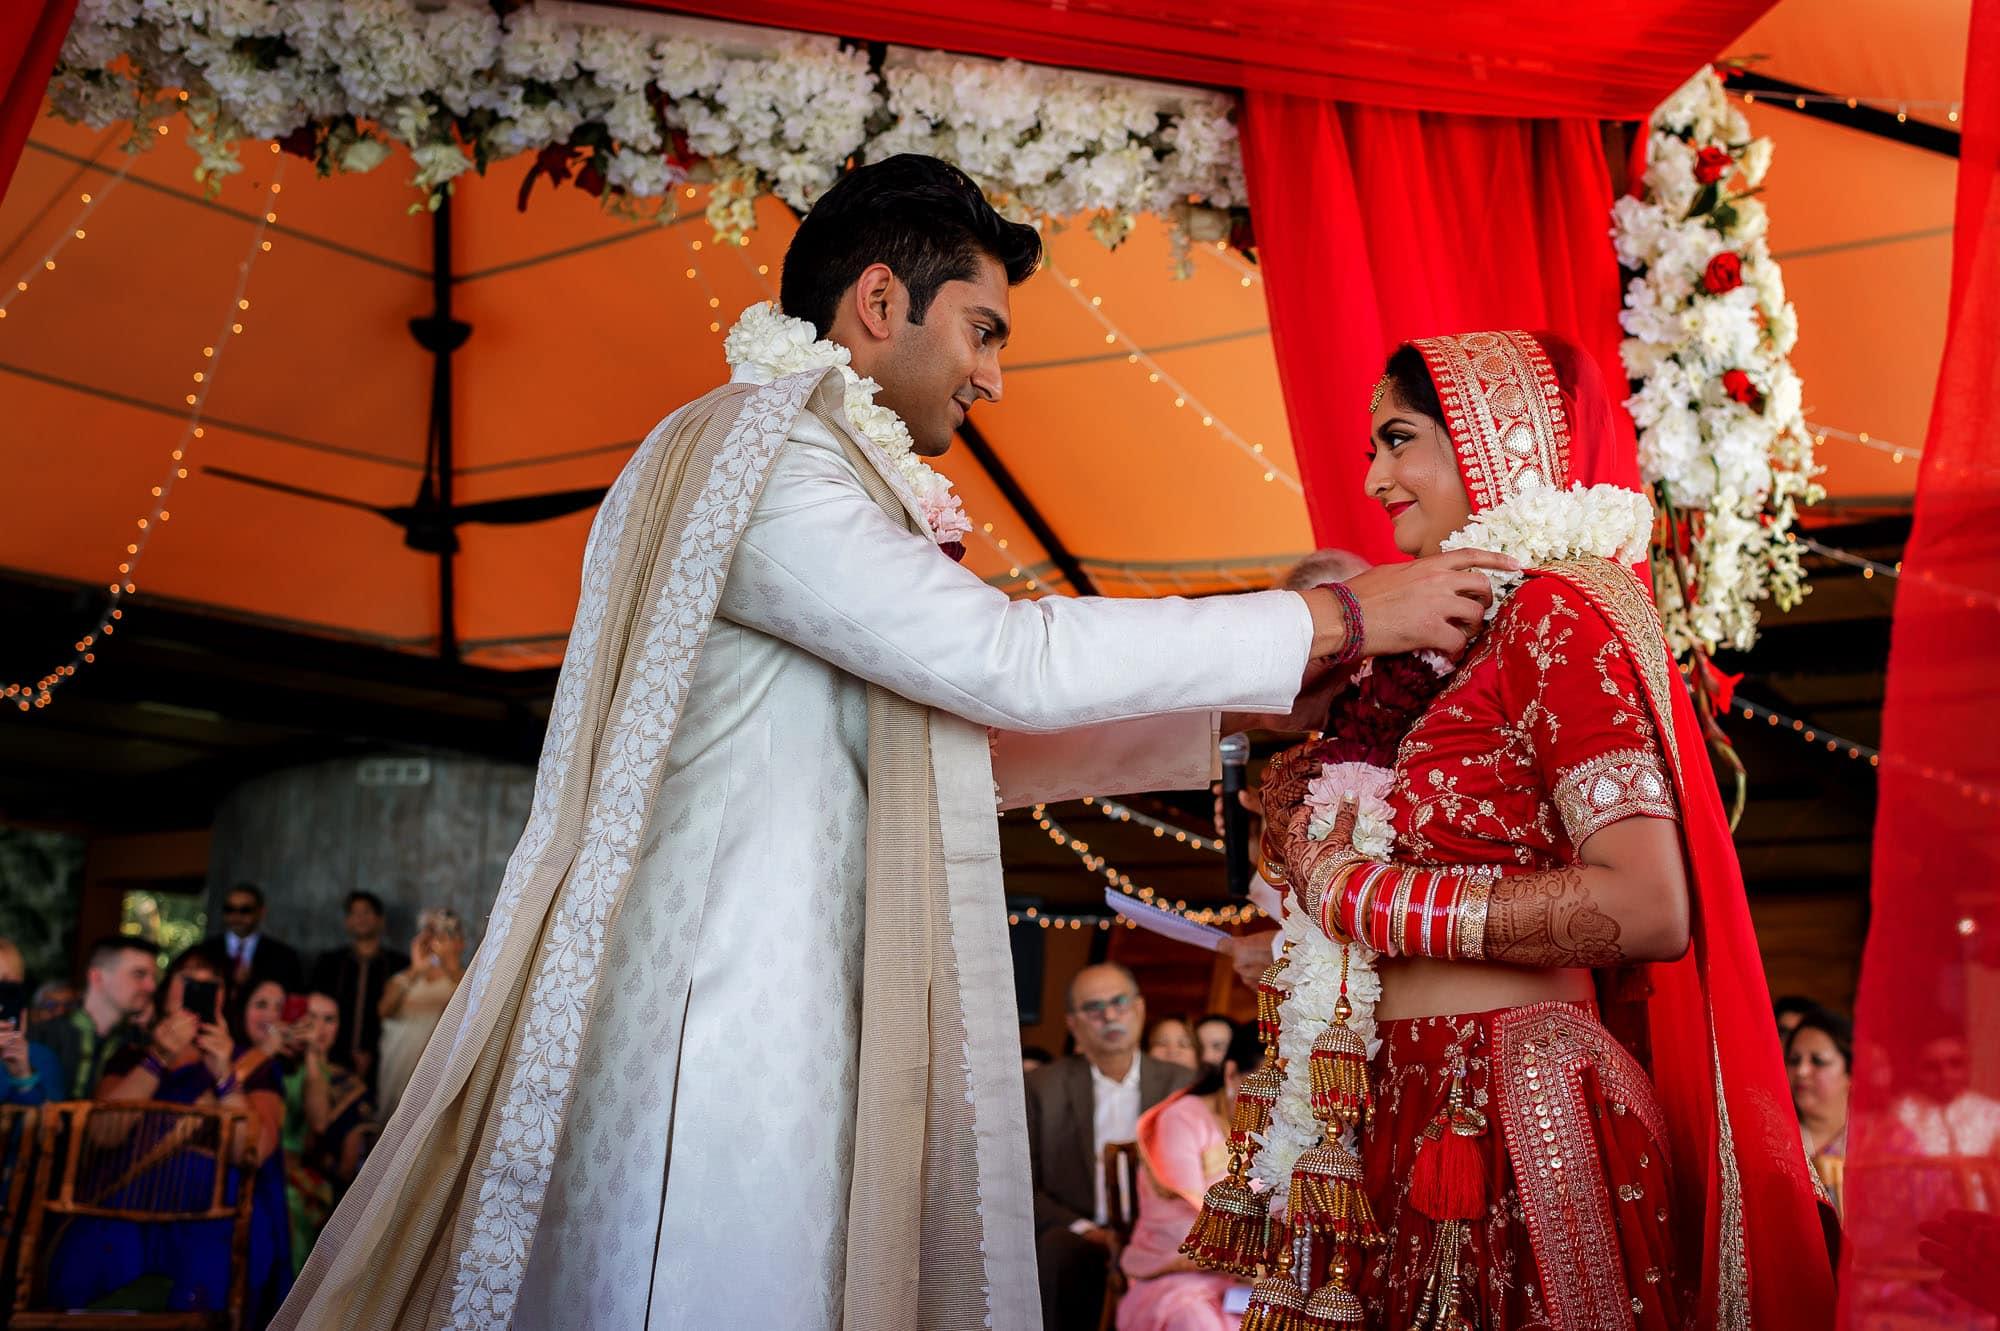 The traditional Hindu Muslim wedding ceremony begins!